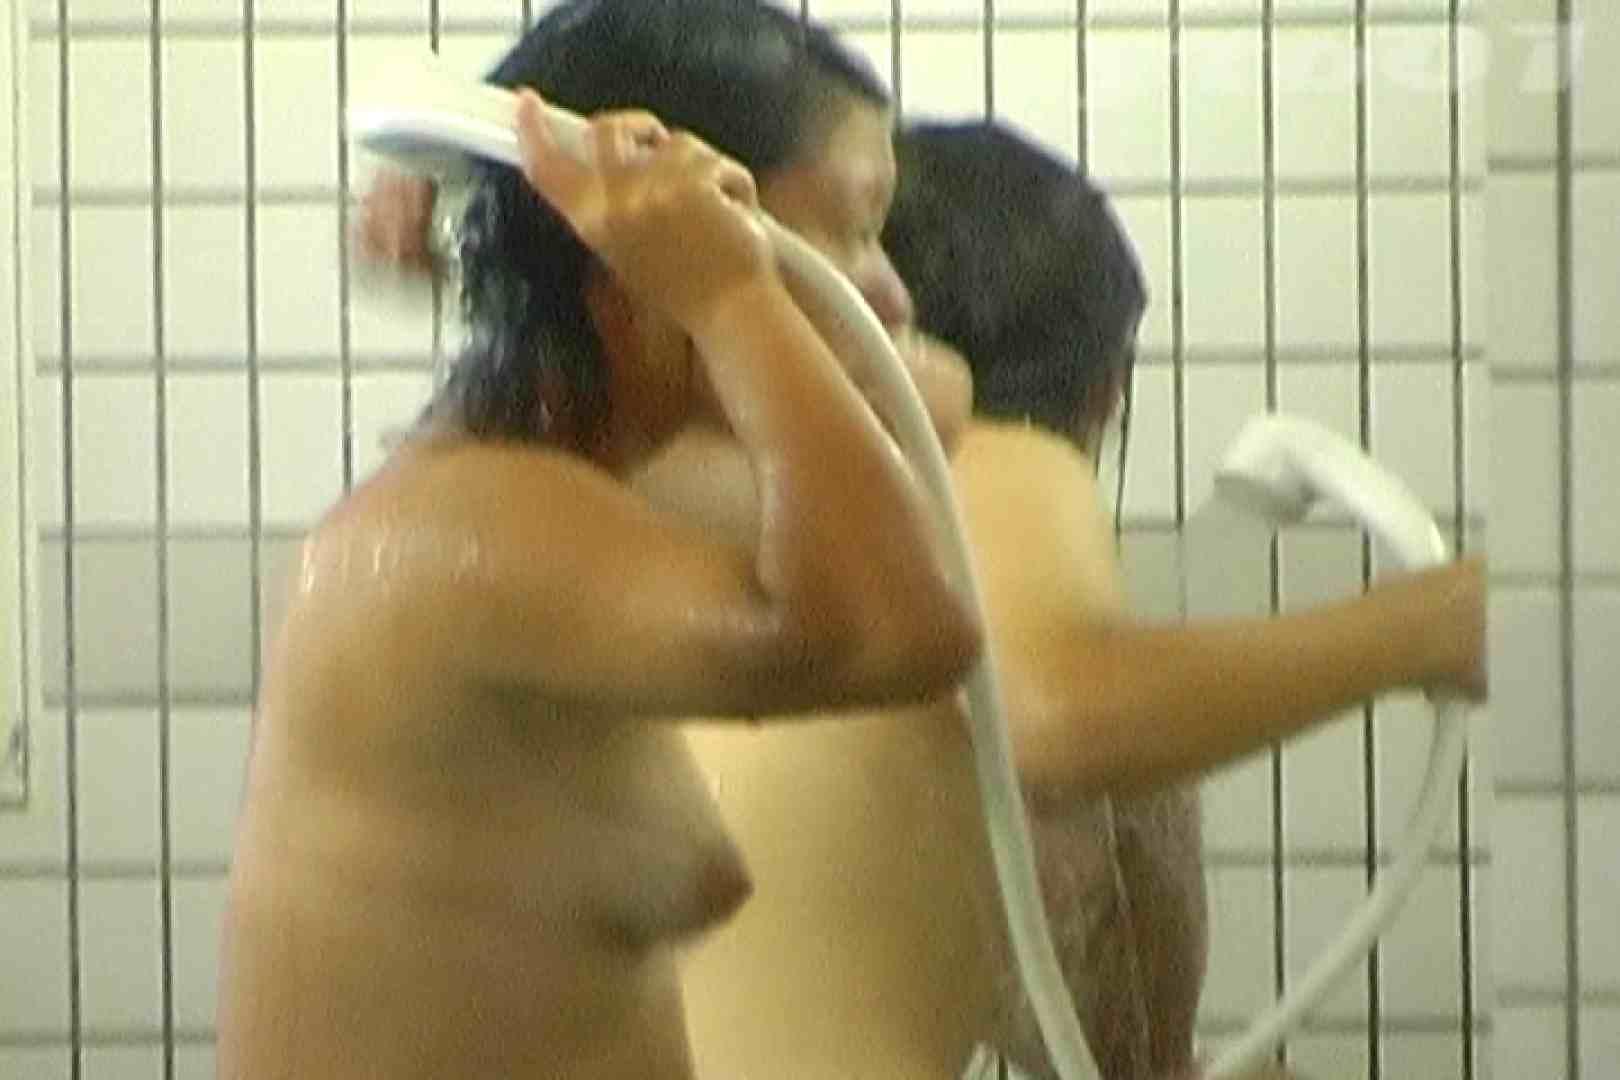 ▲復活限定▲合宿ホテル女風呂盗撮 Vol.01 入浴中 | 合宿中の出来事 盗撮 85画像 21